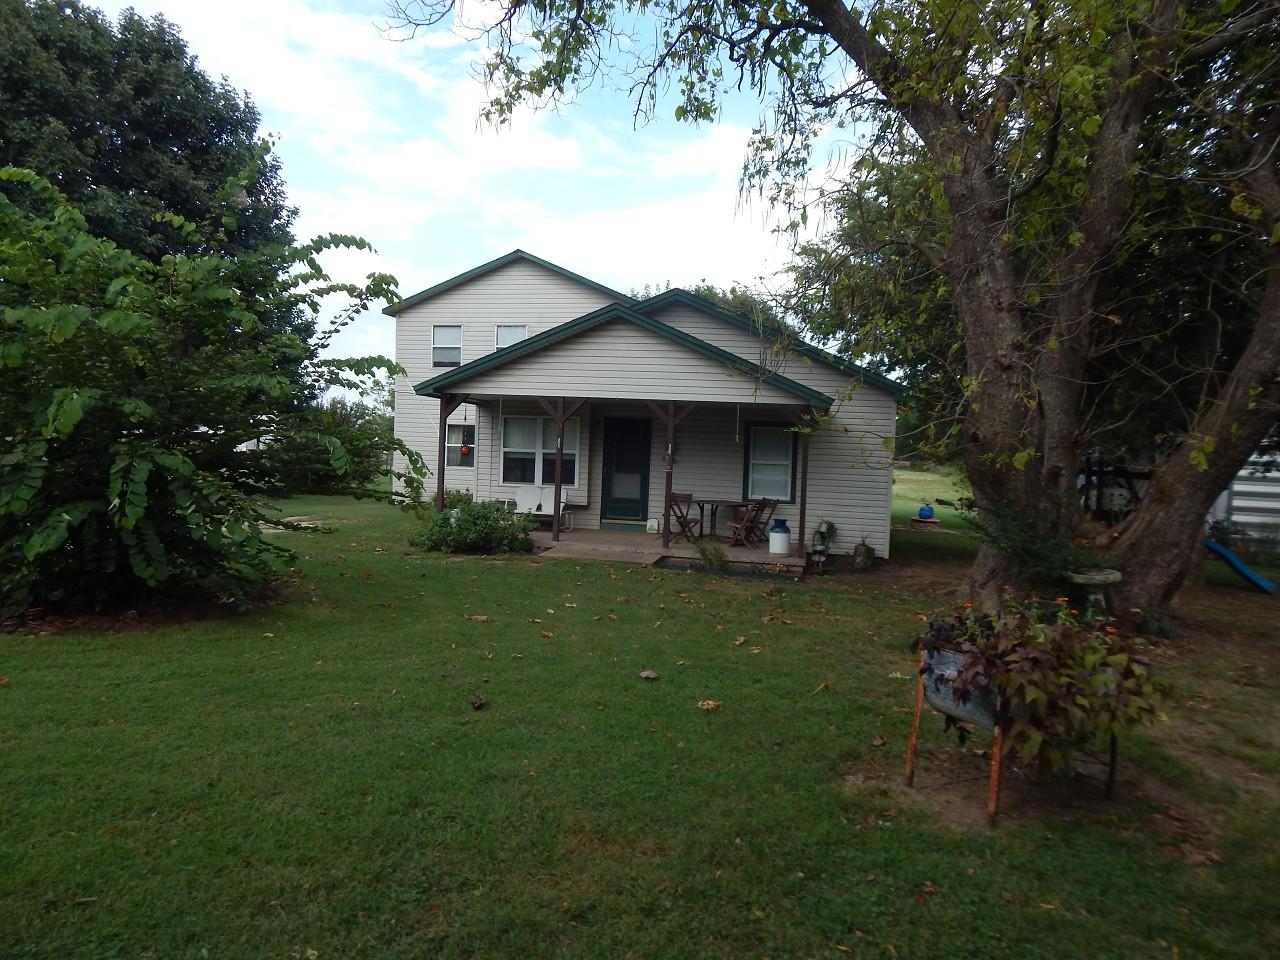 Real Estate for Sale, ListingId: 30055009, Coweta,OK74429